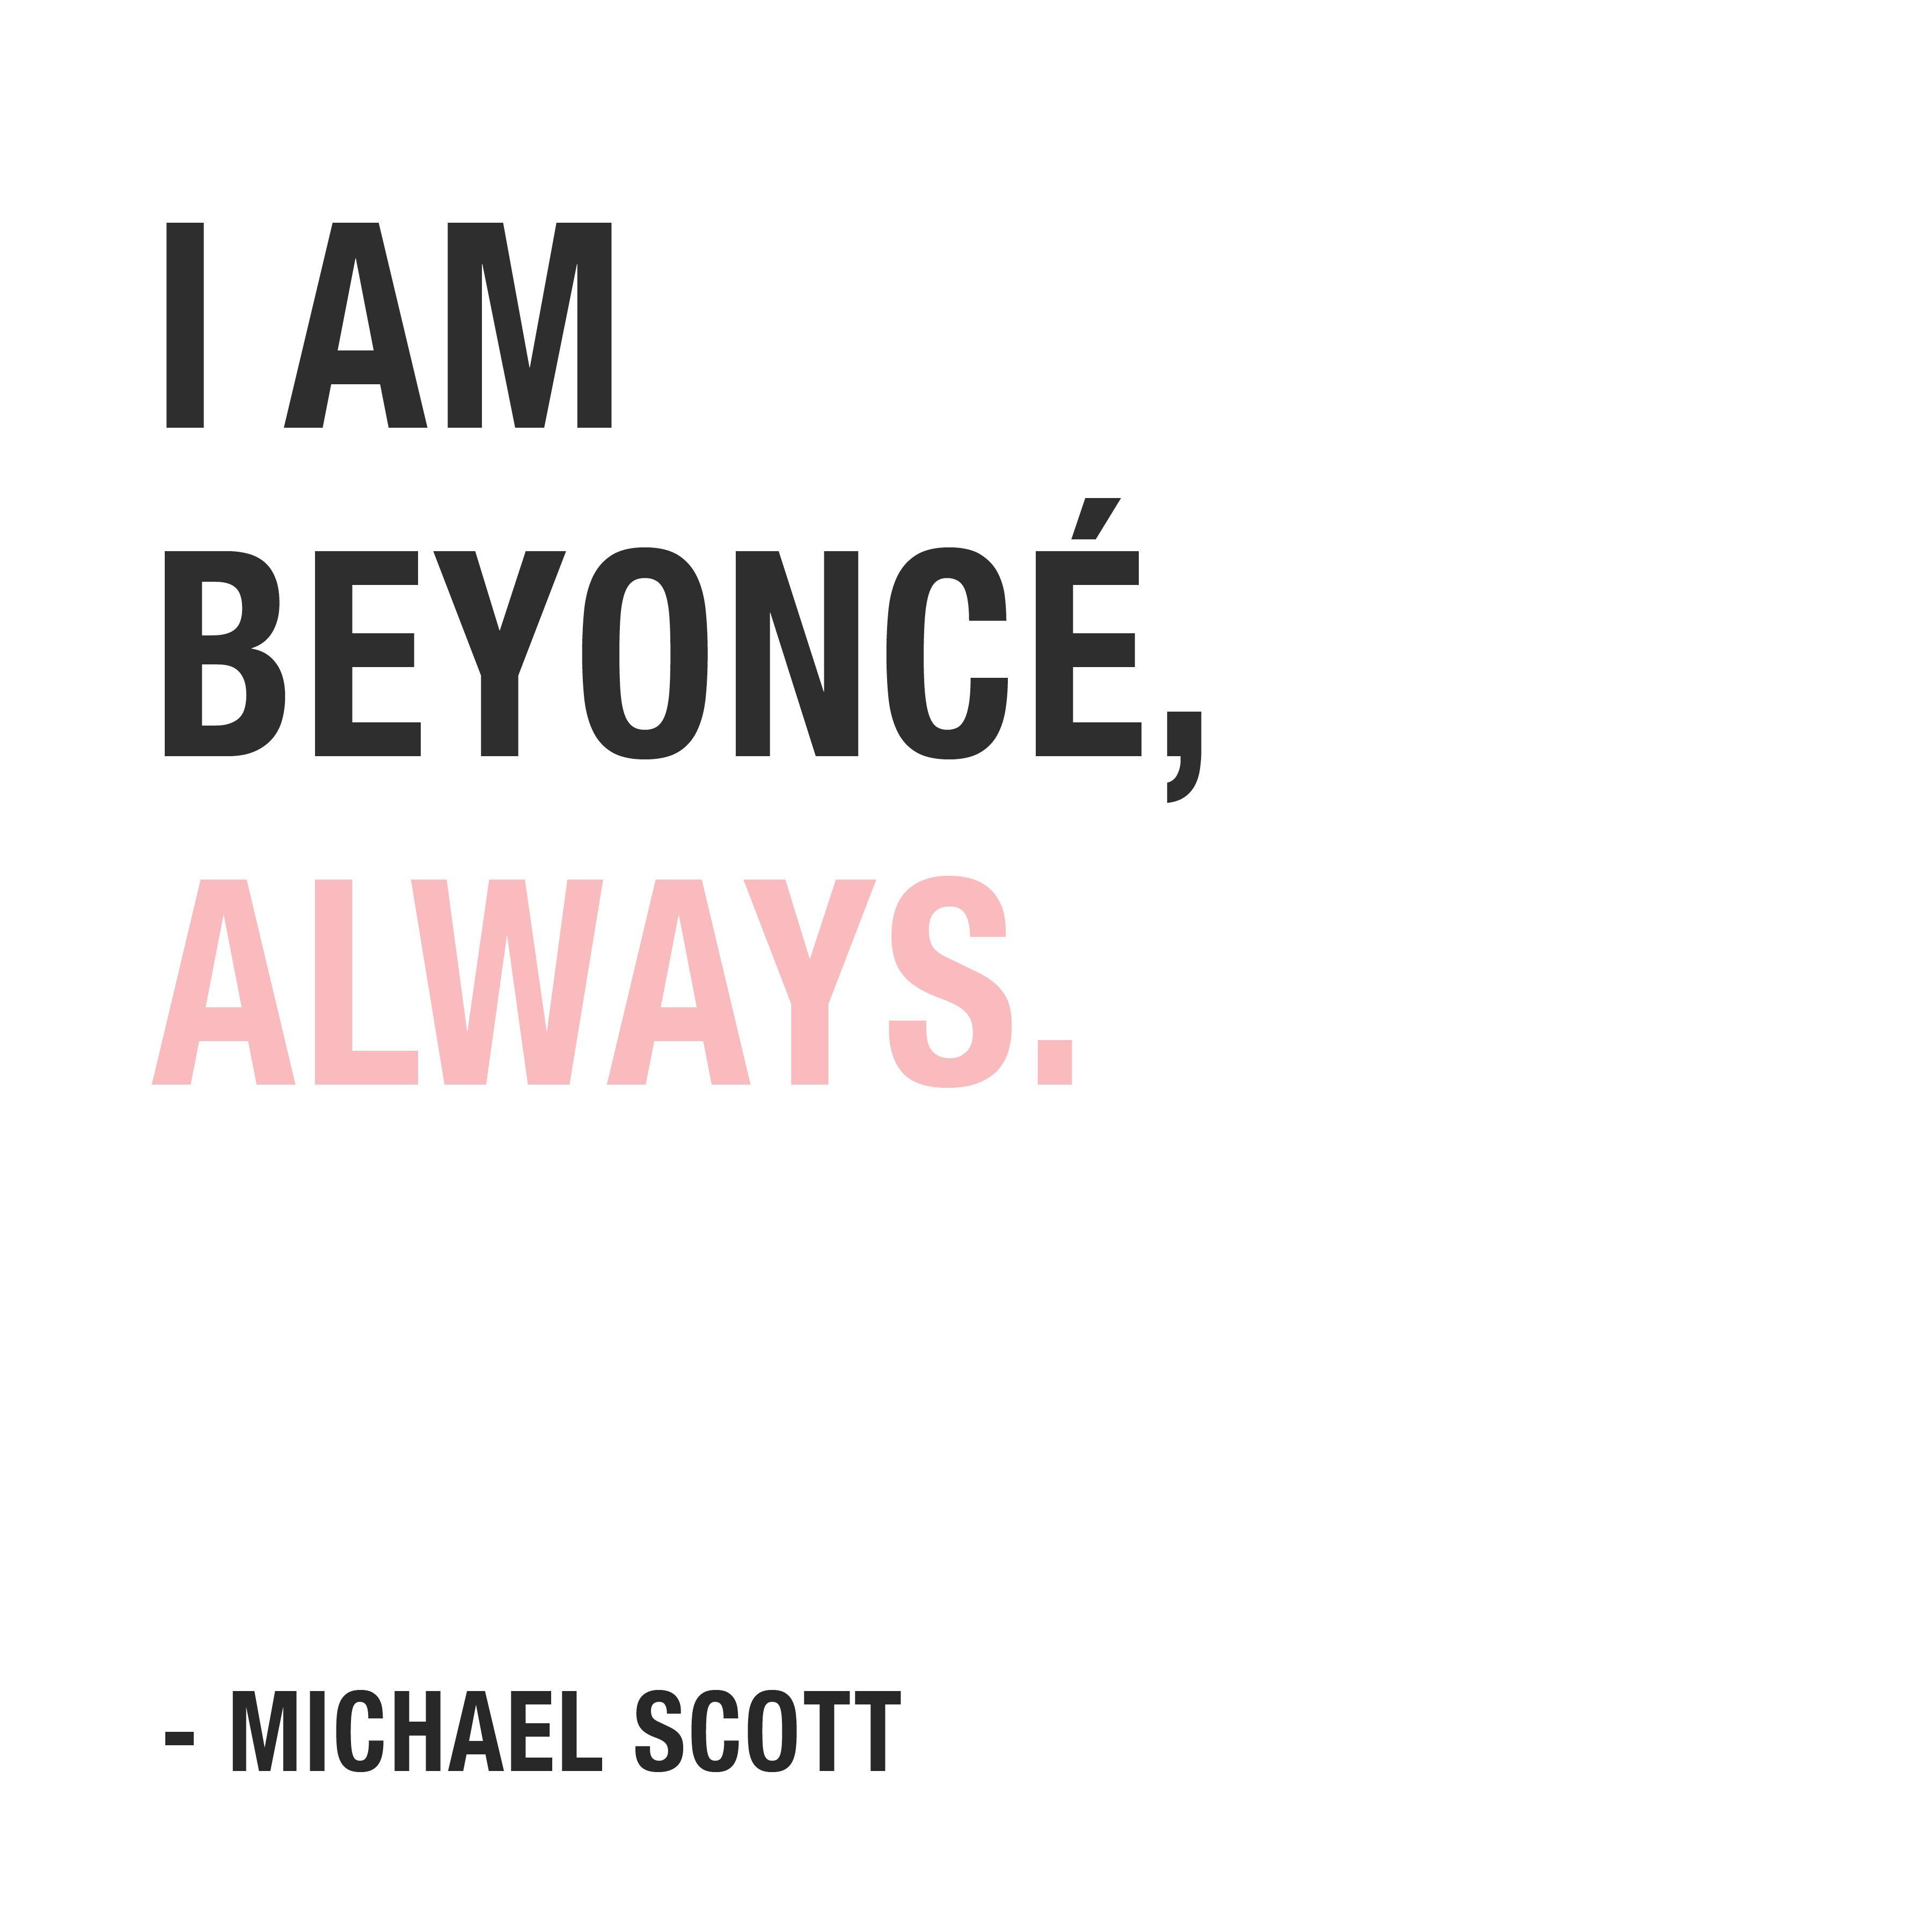 I am Beyonce, always. - Michael Scott #theoffice